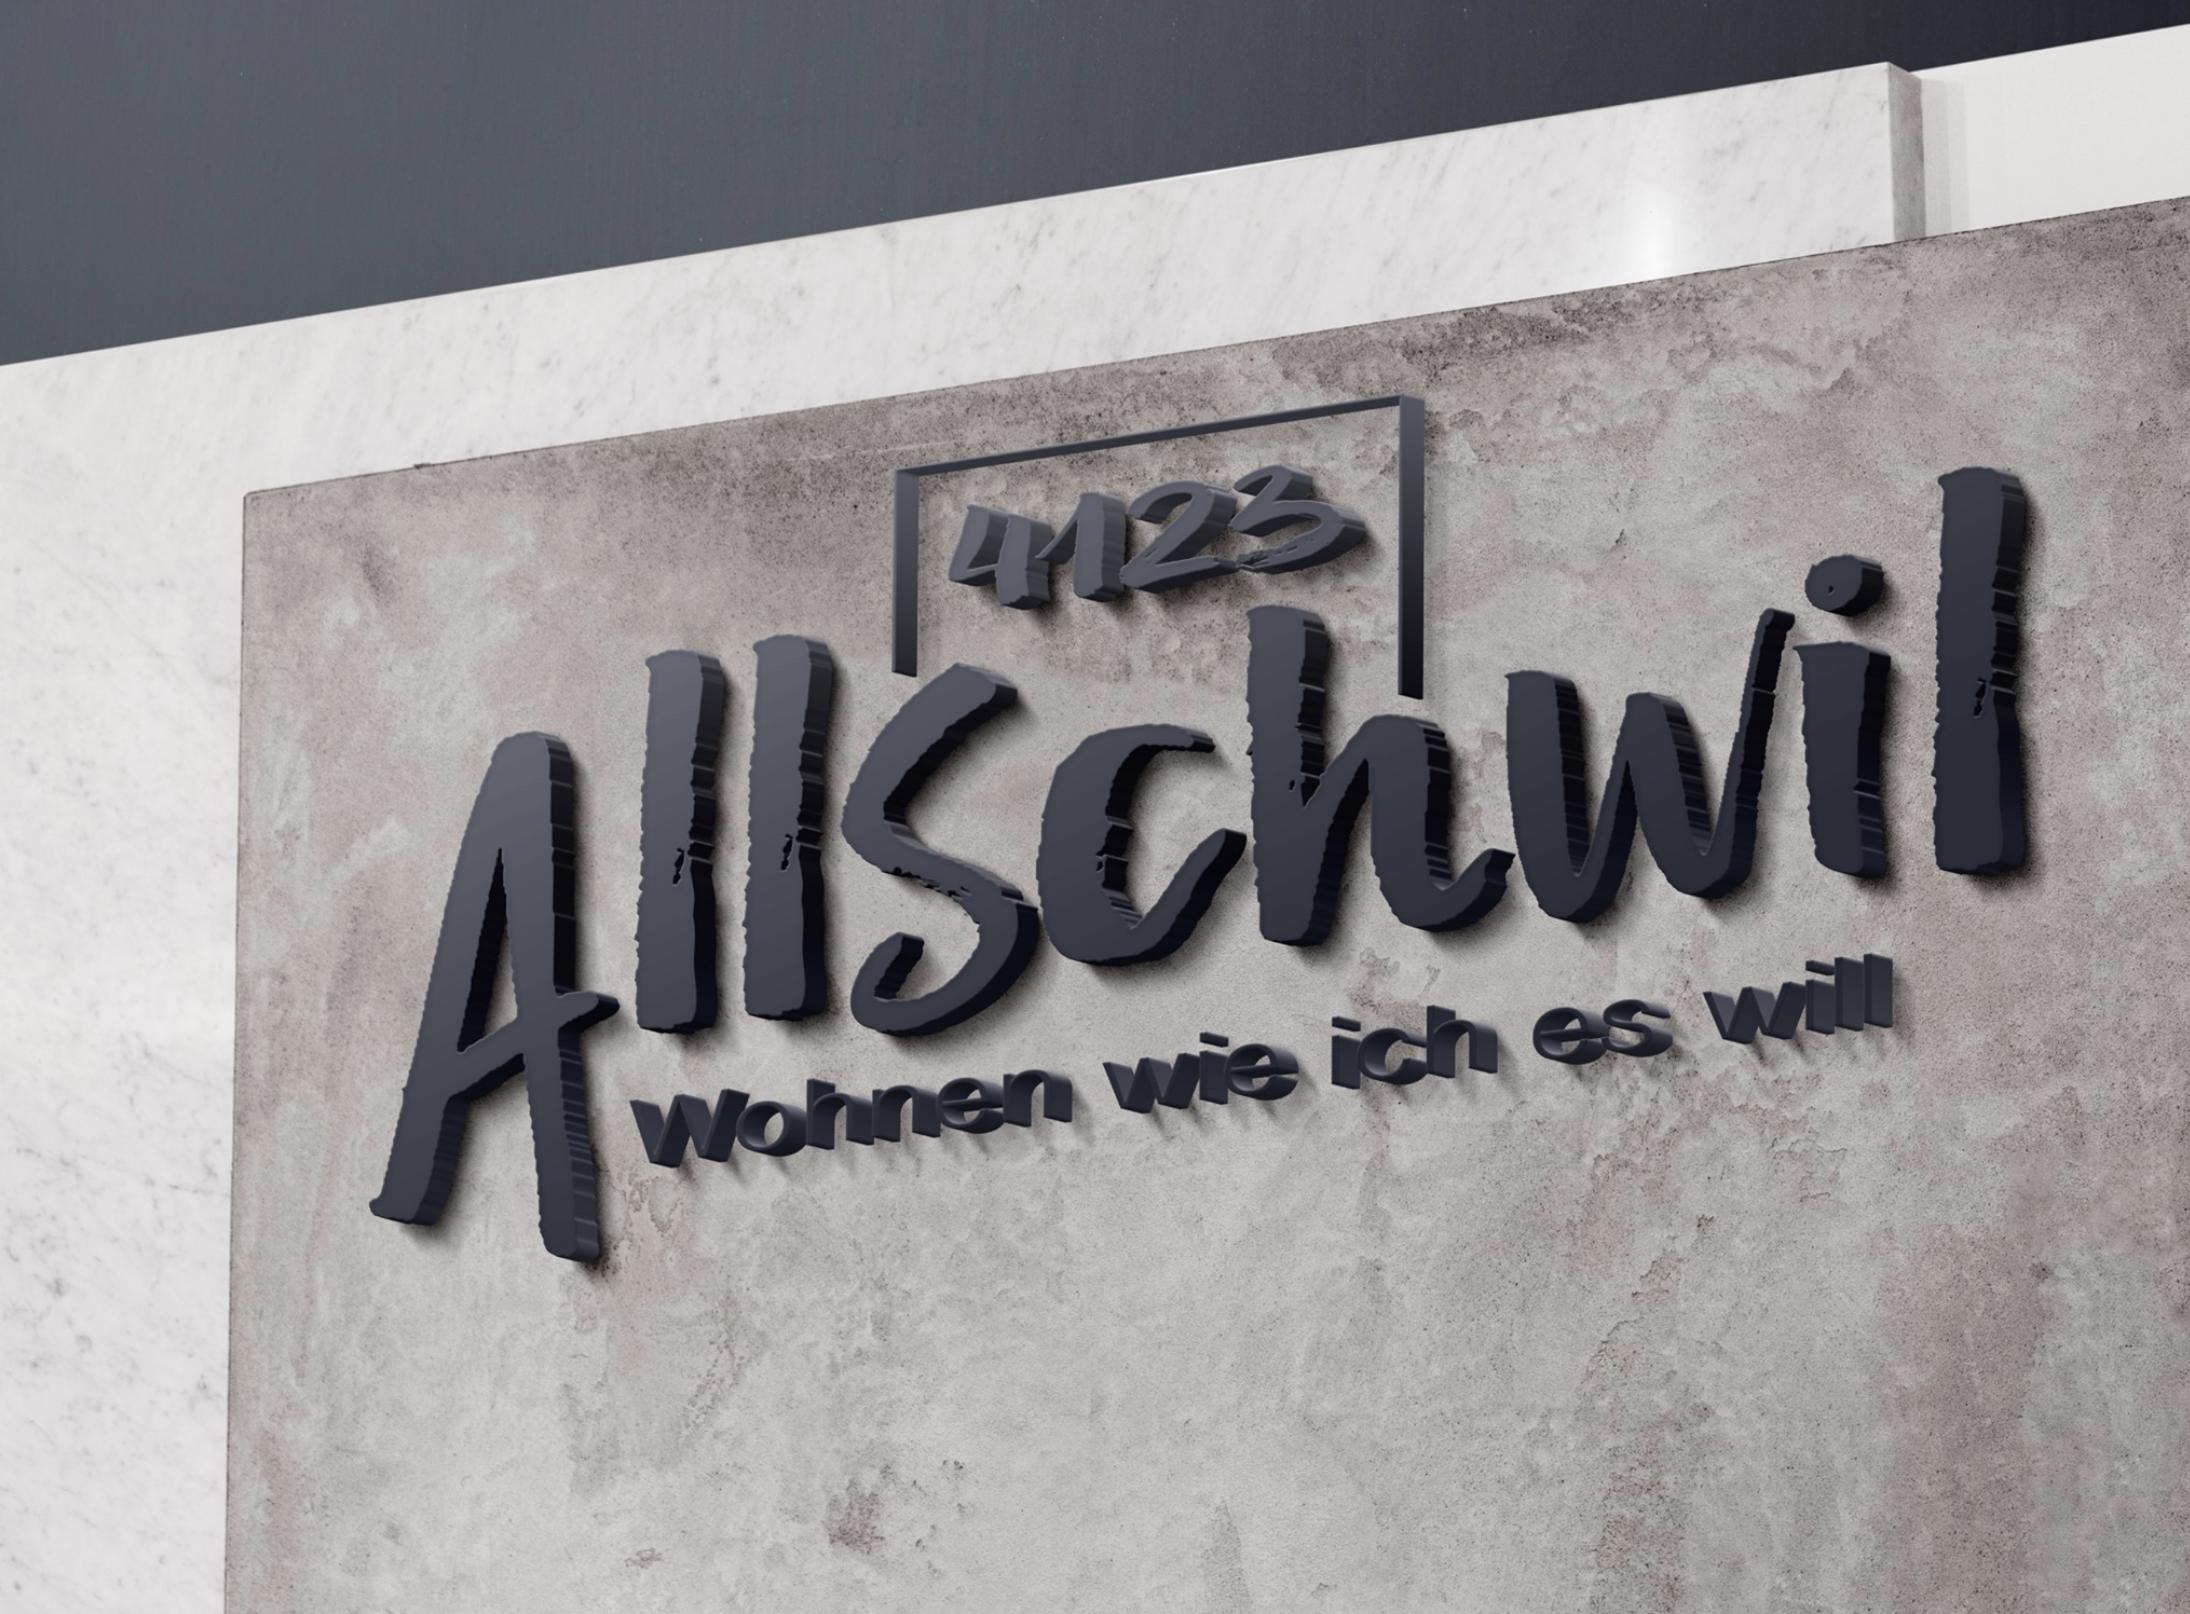 TEND Allschwil